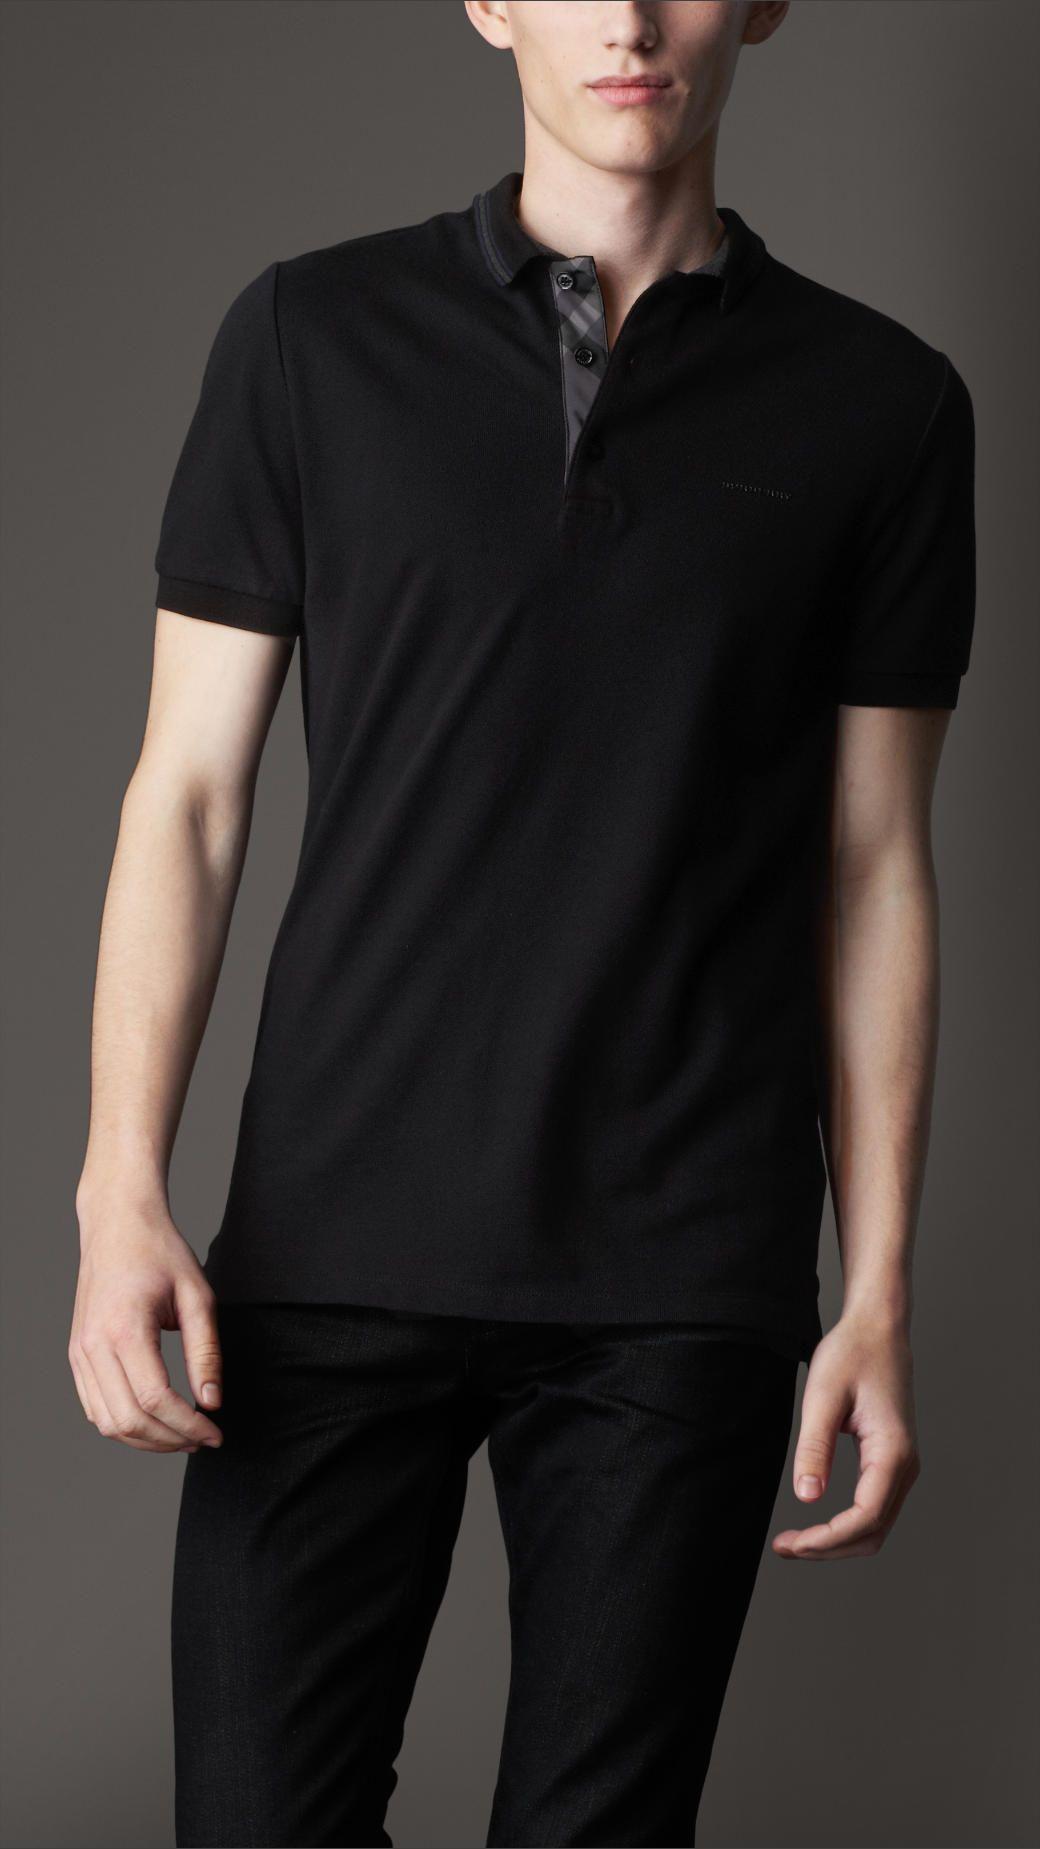 Burberry Polo Burberry T Shirt Polo Shirt Mens Shirts